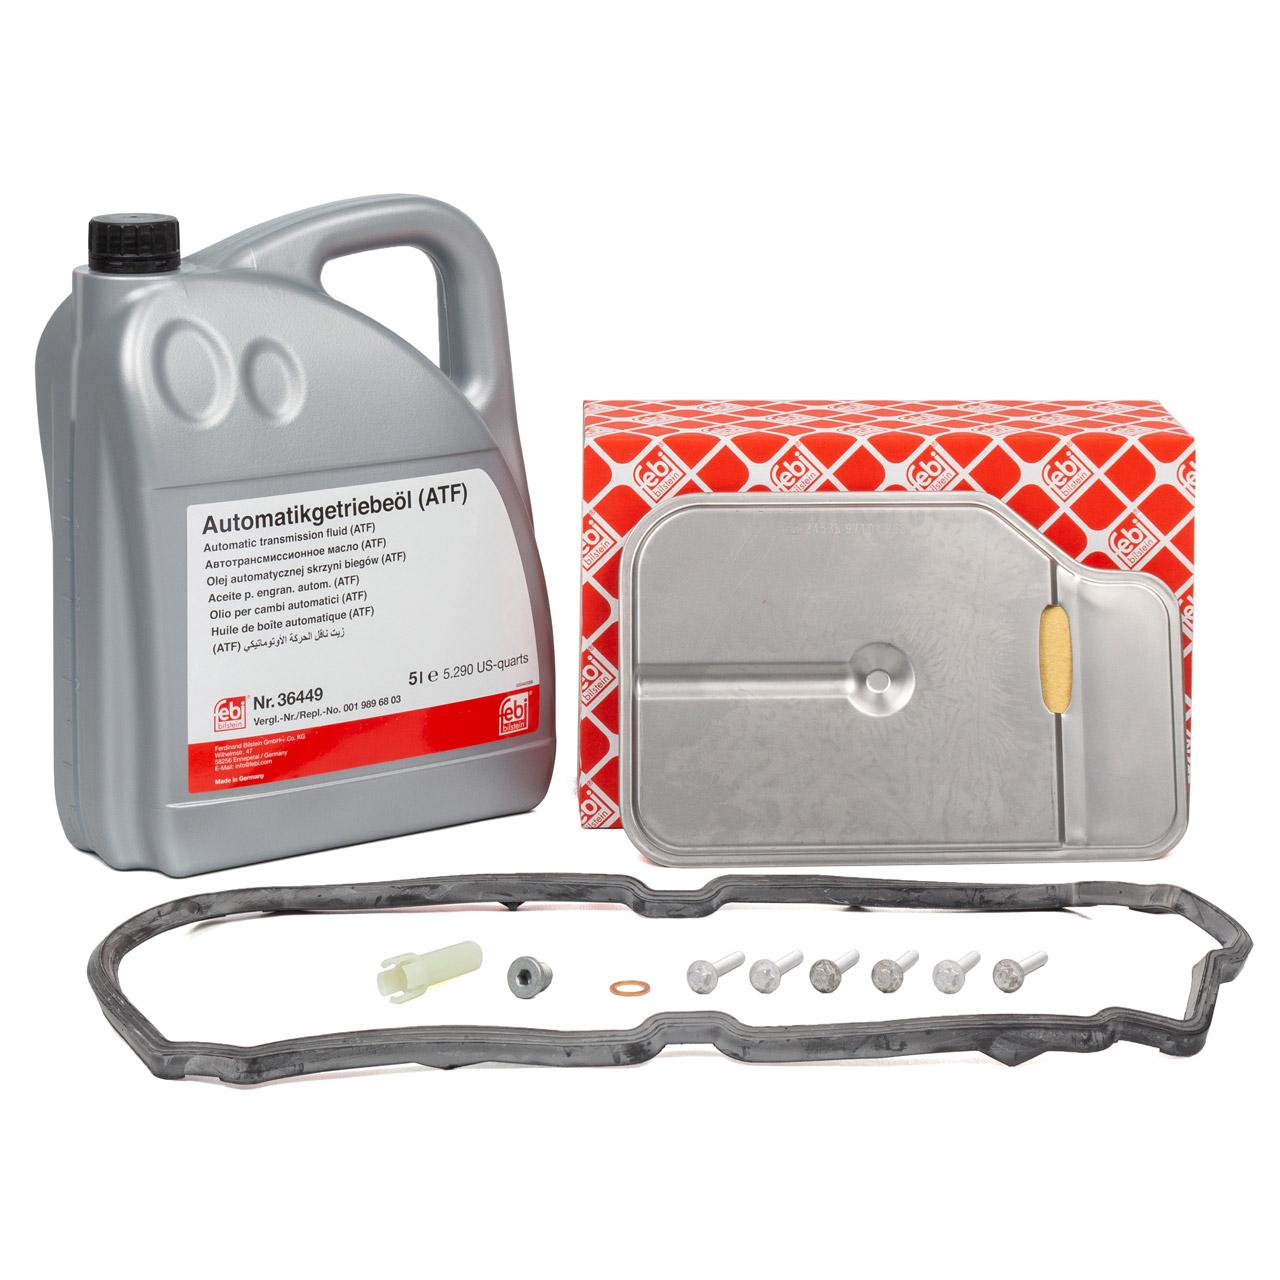 FEBI Hydraulikfilter Satz + Überlaufrohr + 5L Getriebeöl MERCEDES 7-Gang 722.9